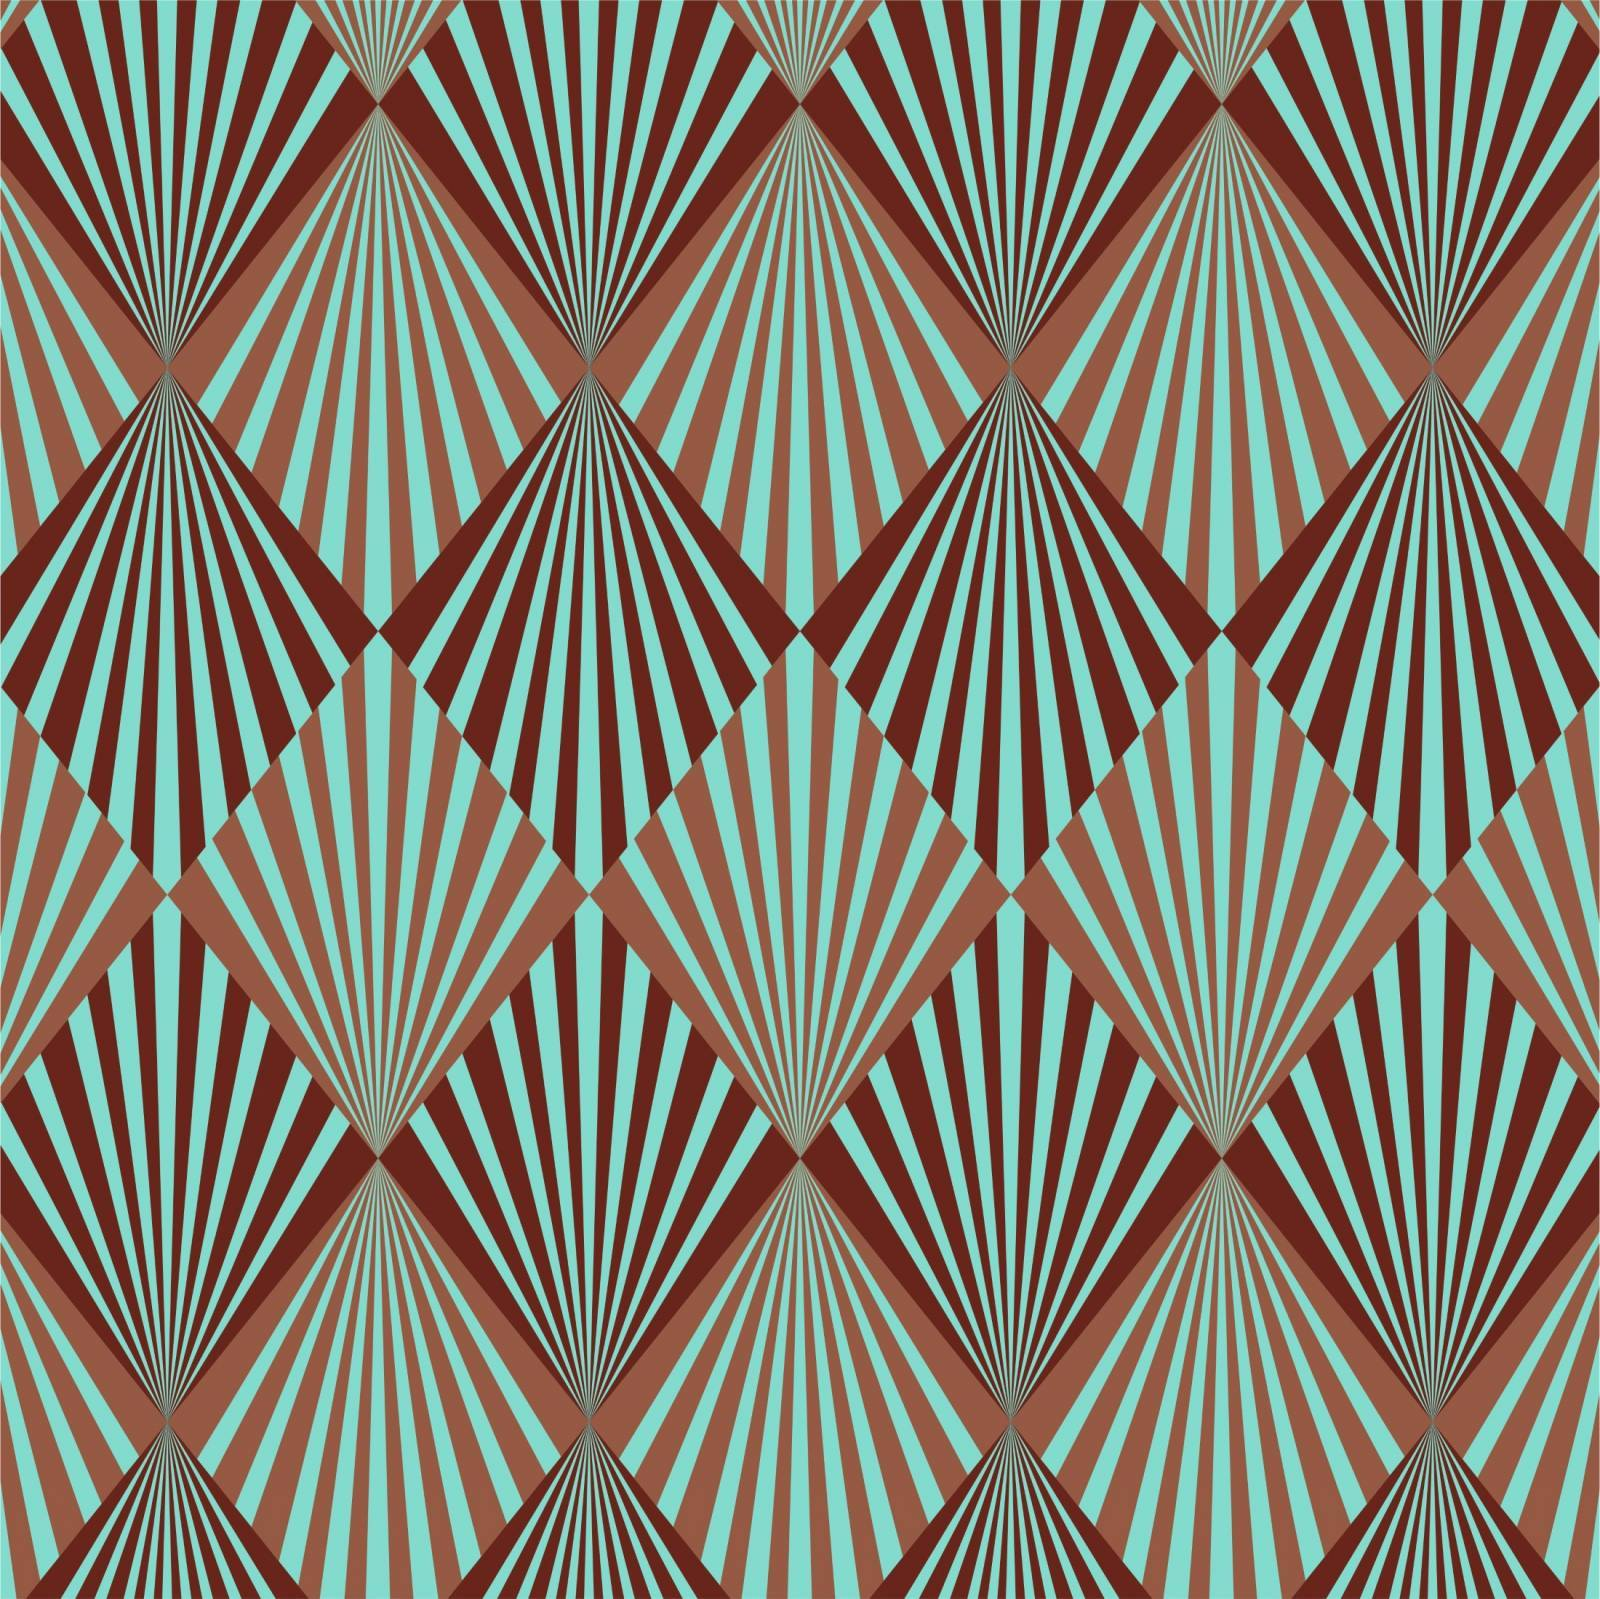 Como Funciona O Adesivo De Credito Santander ~ Papel de Parede Adesivo Geometrico Retro Redecorei